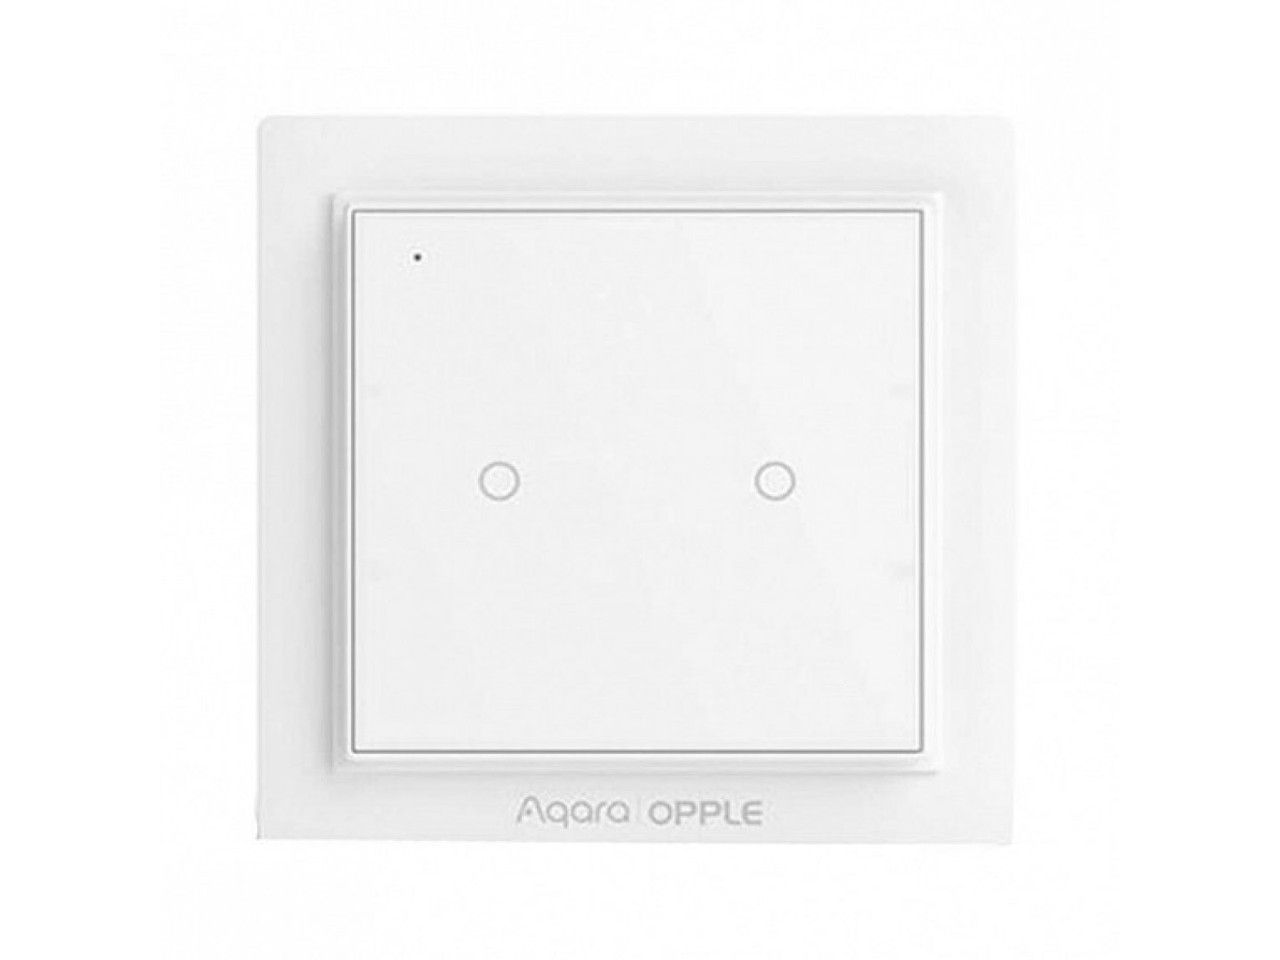 Бездротовий вимикач Aqara Opple Light Switch Single-Button Zigbee 3.0 WXCJKG11LM